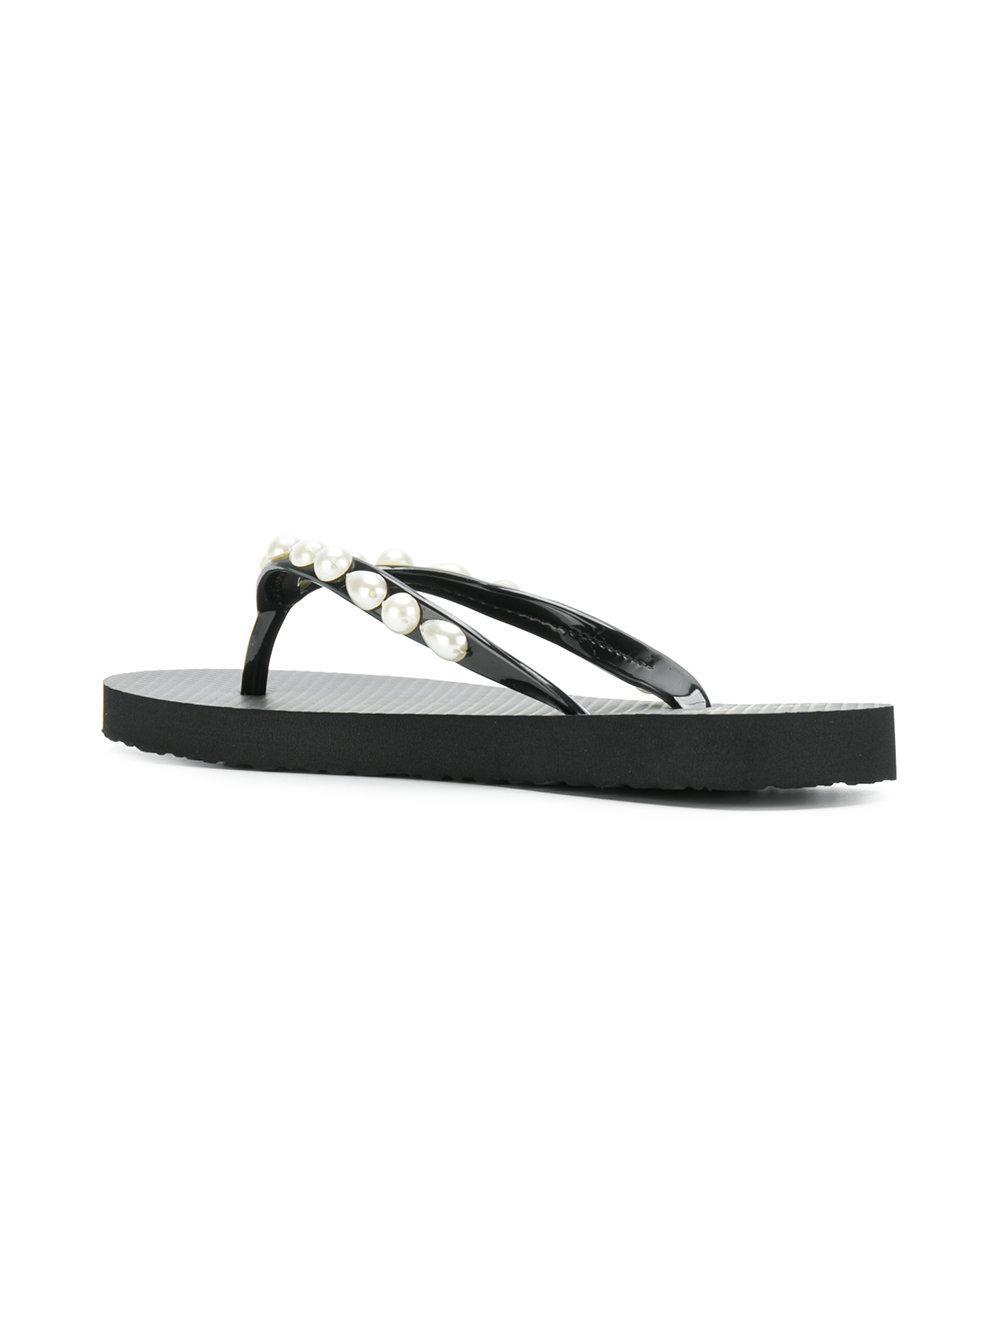 bcd14660a93c Lyst - Tory Burch Pearl Thin Flip-flops in Black